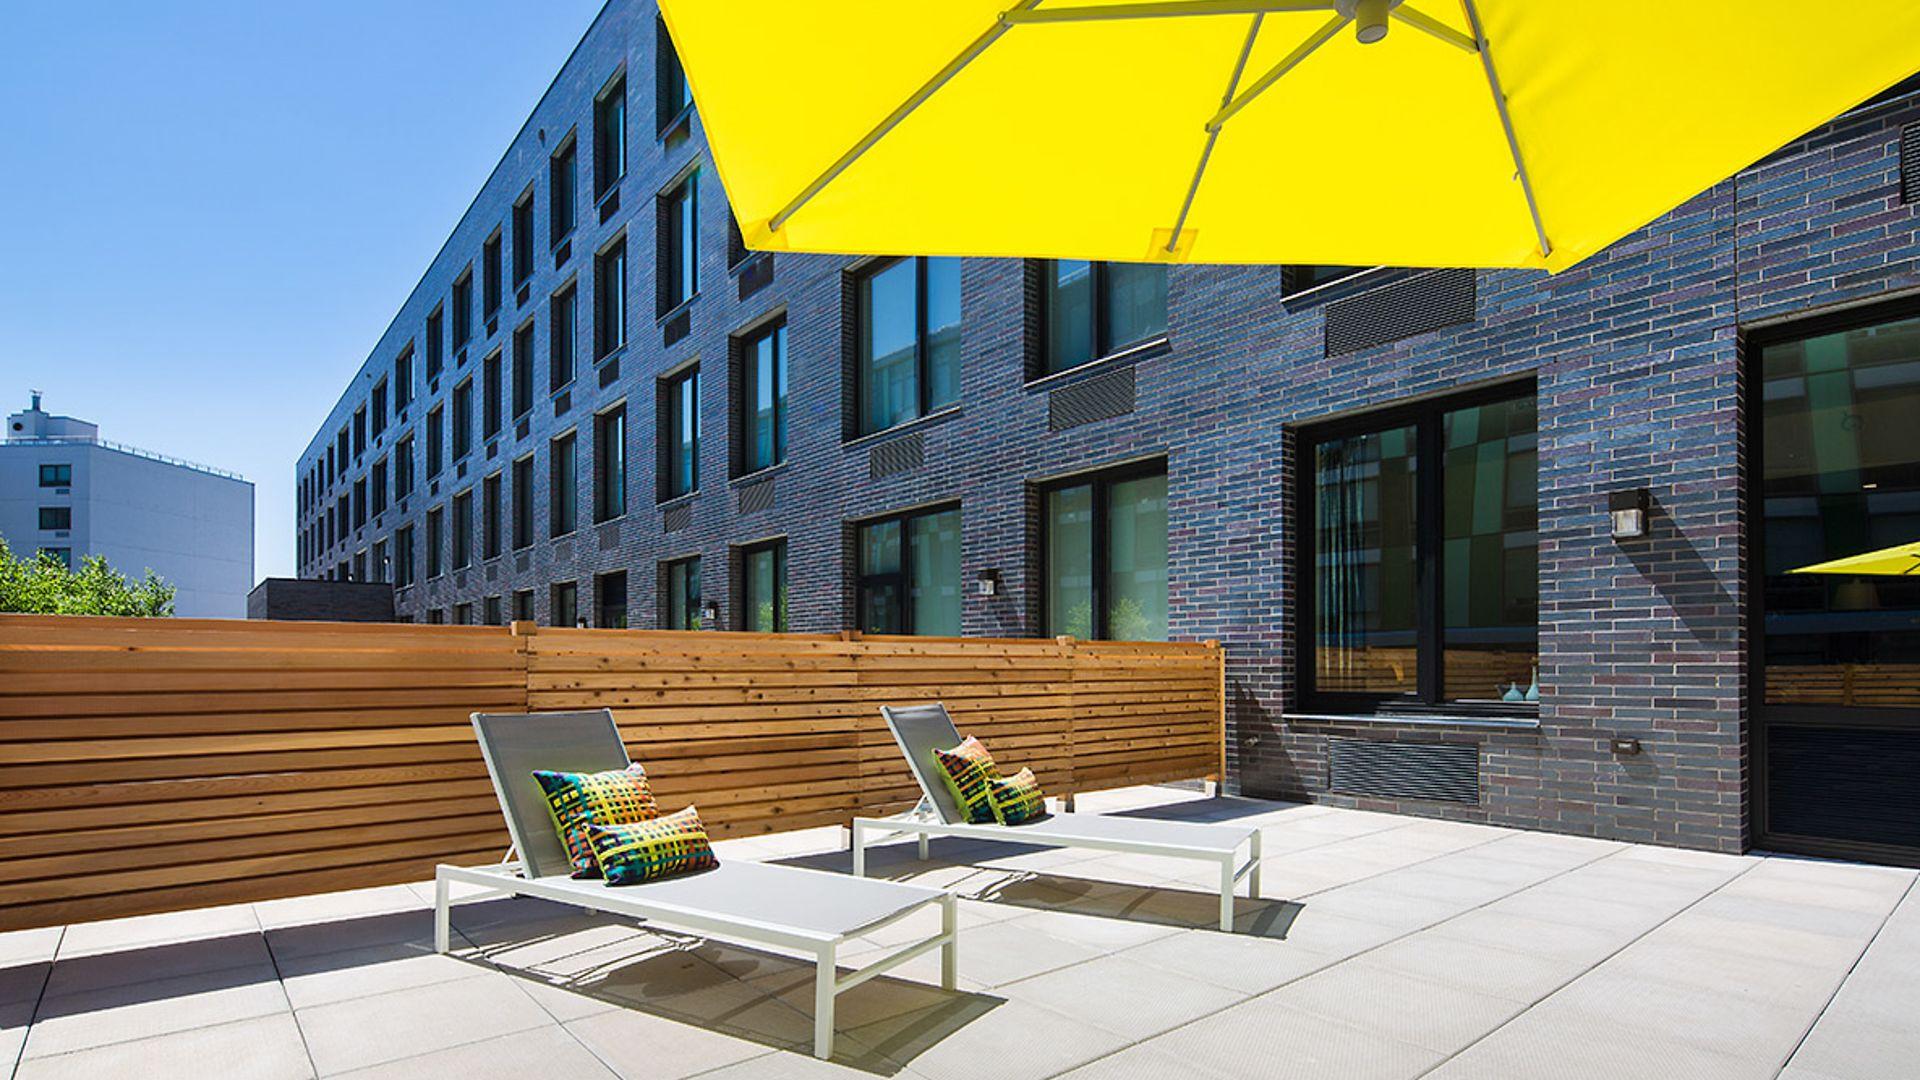 Atelier Apartments - Rooftop Deck